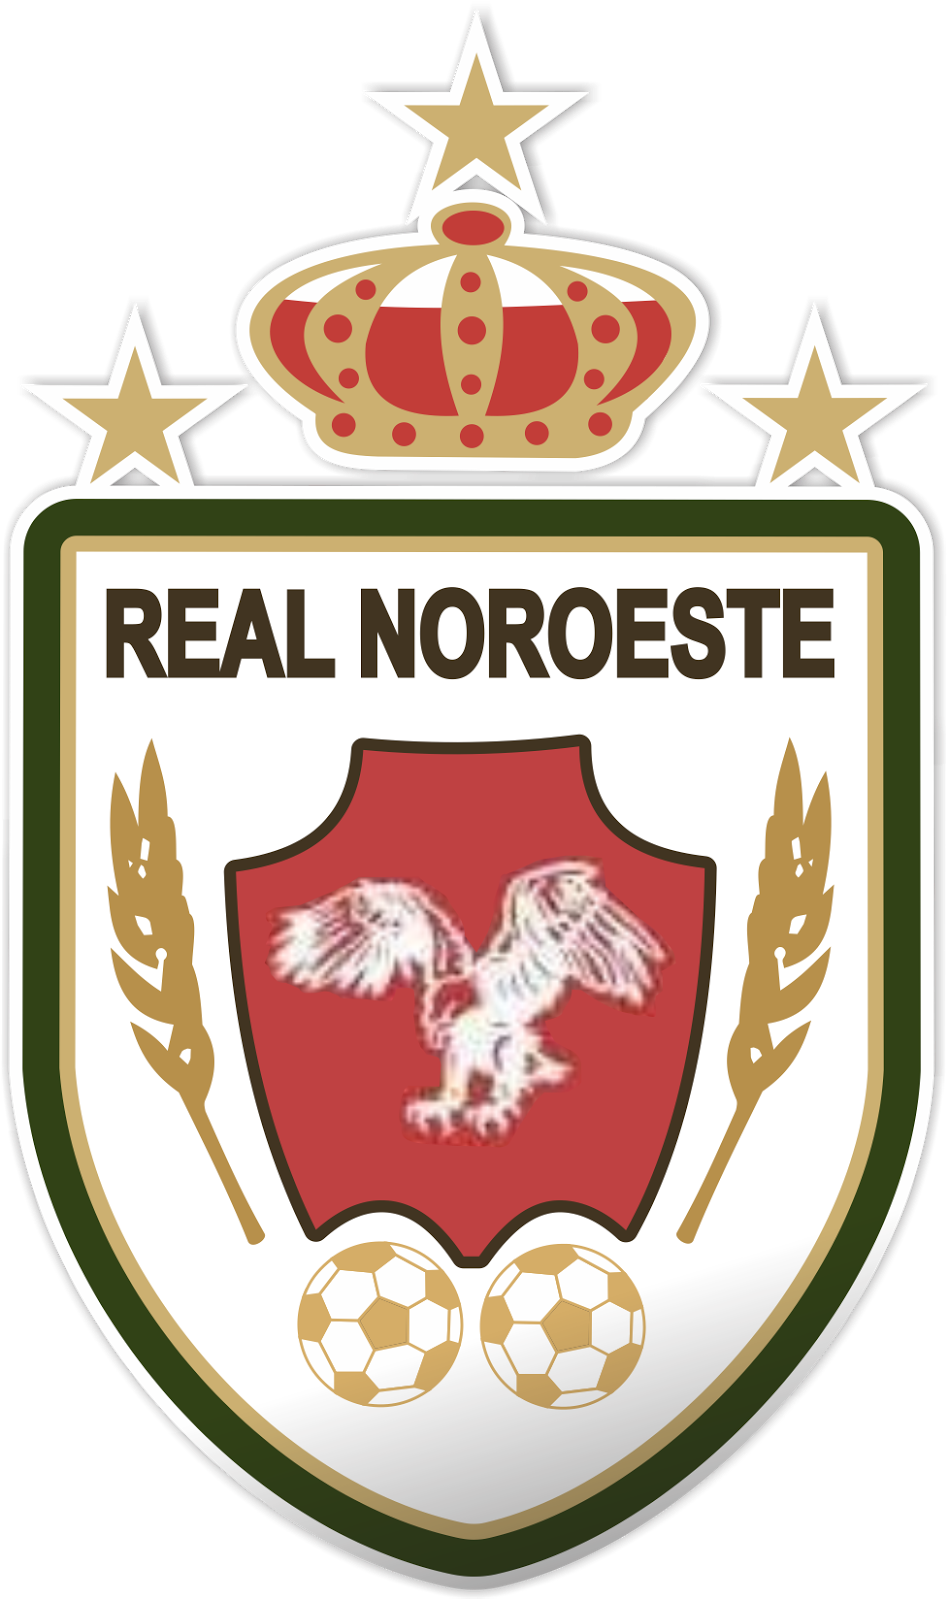 Real Noroeste logo